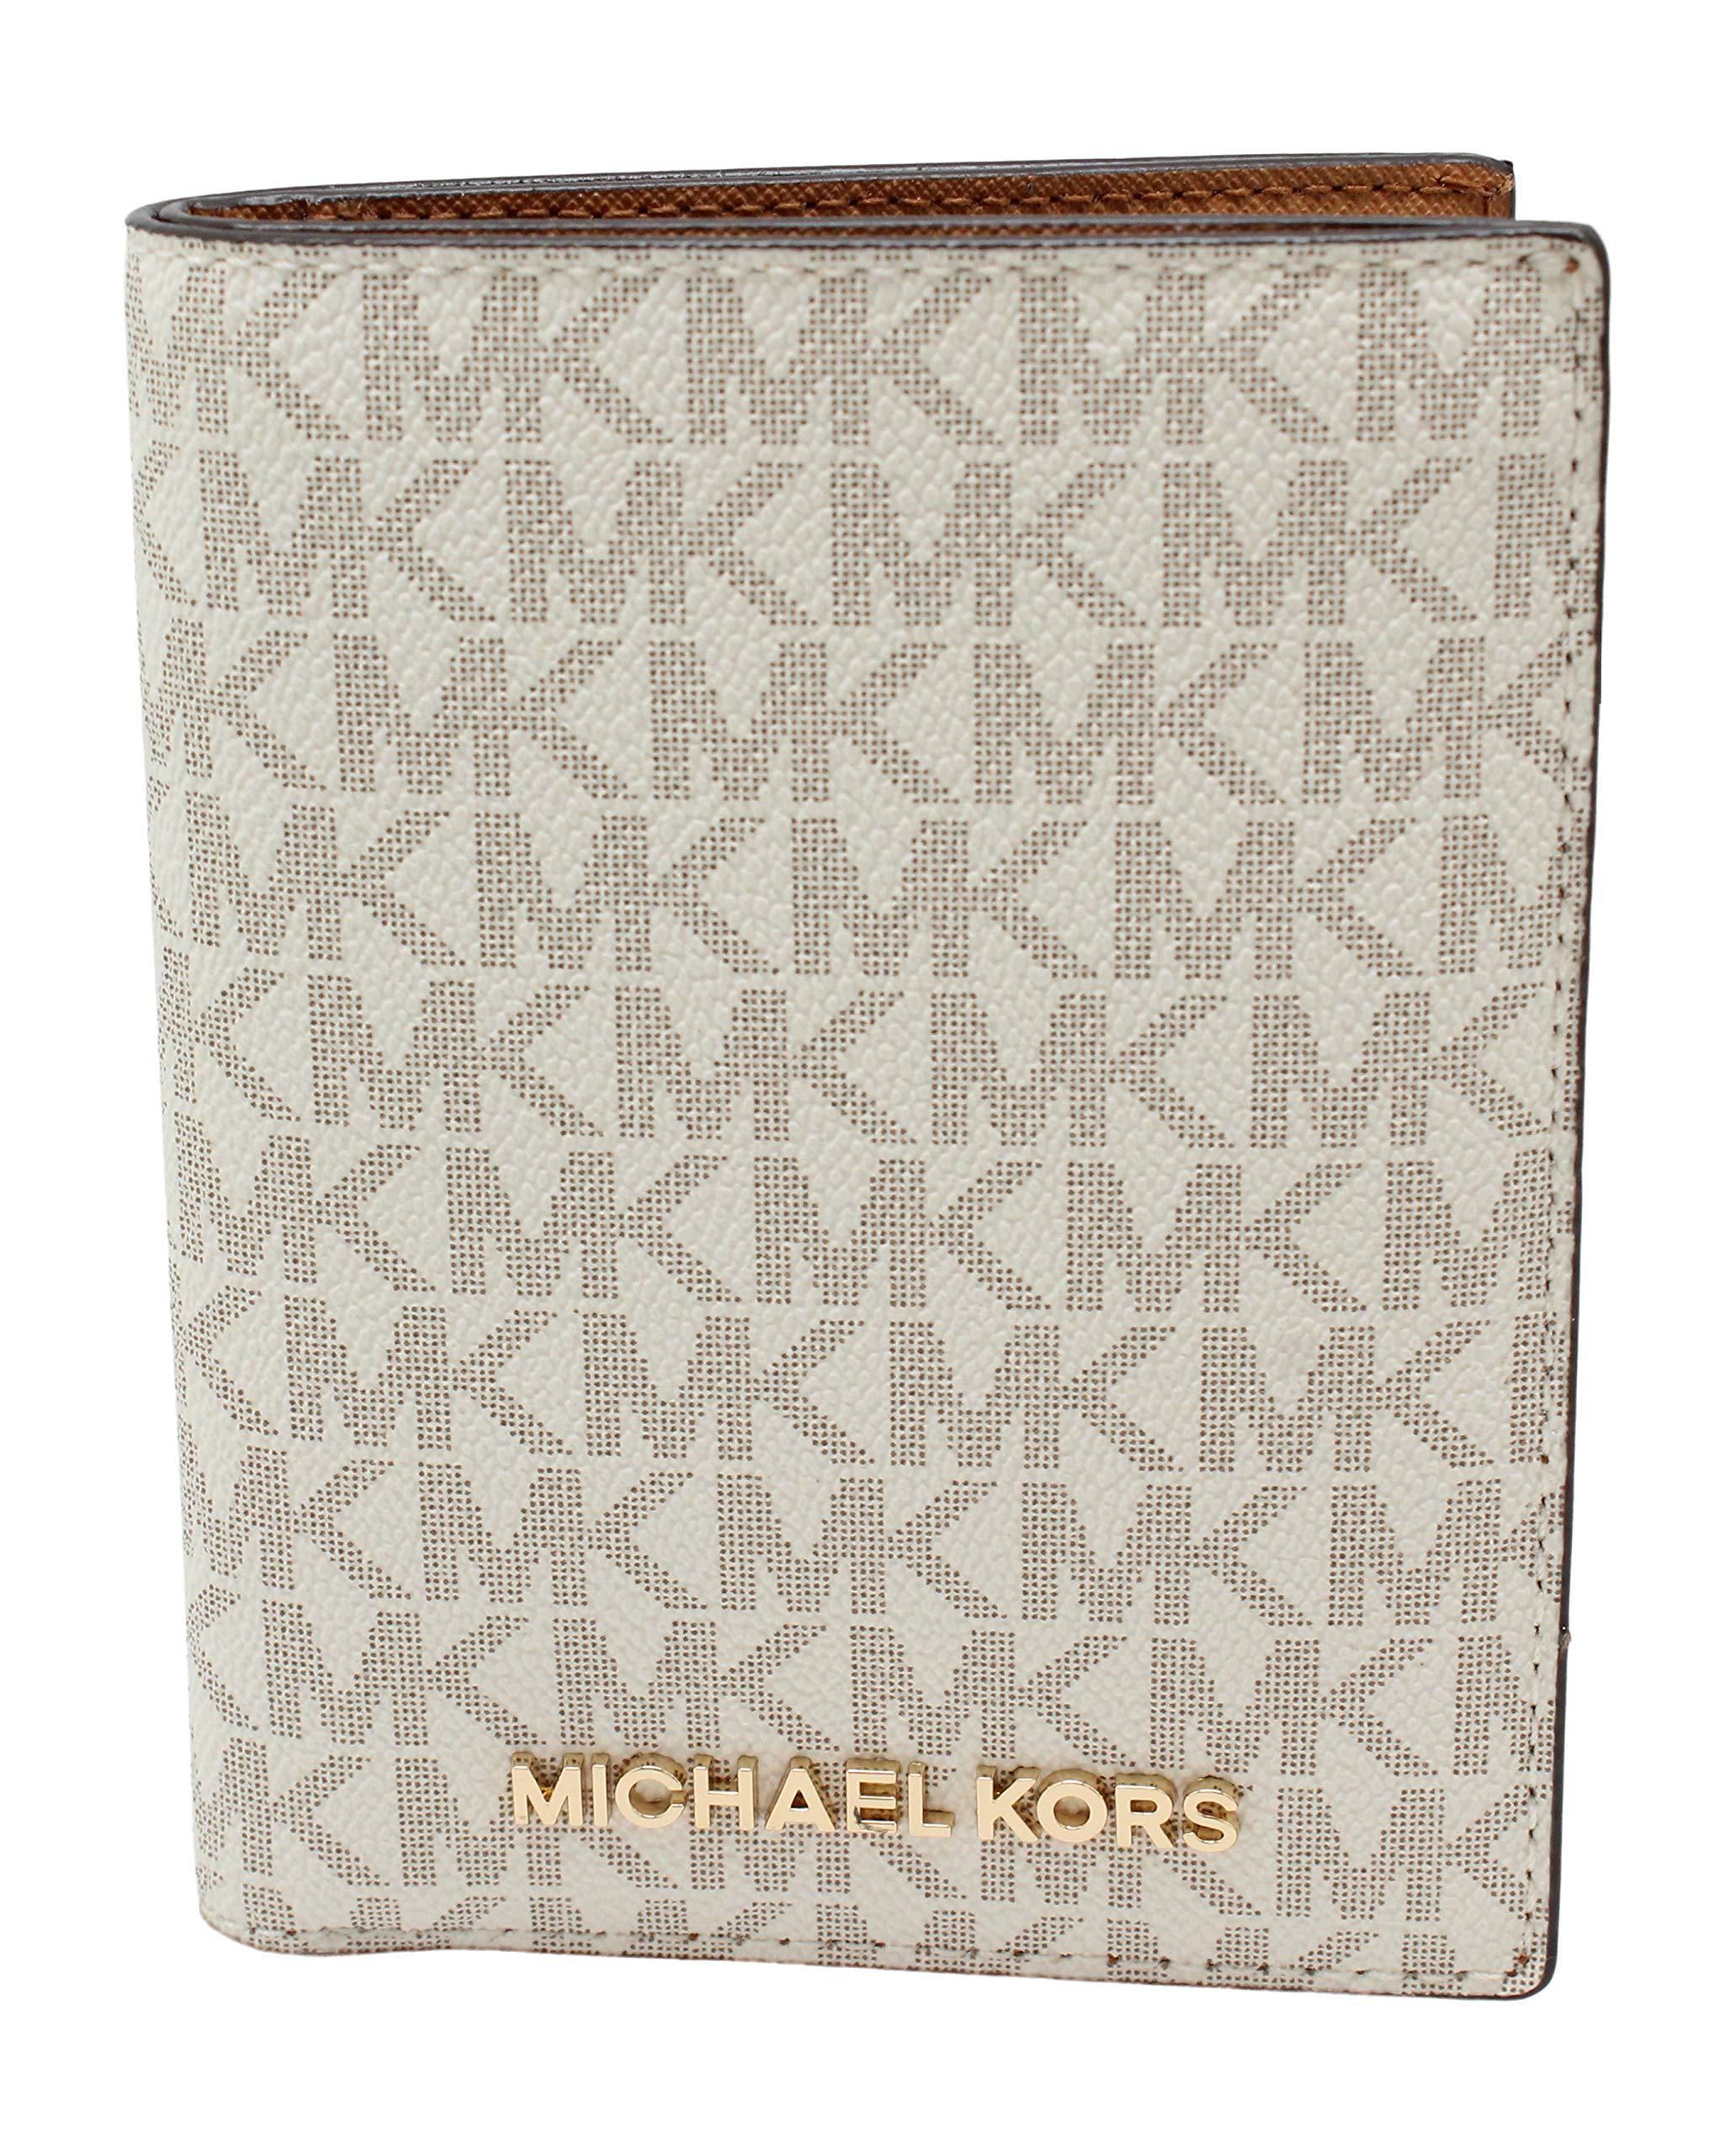 Michael Kors Jet Set Travel Passport Holder Wallet Case Vanilla PVC 2019 by Michael Kors